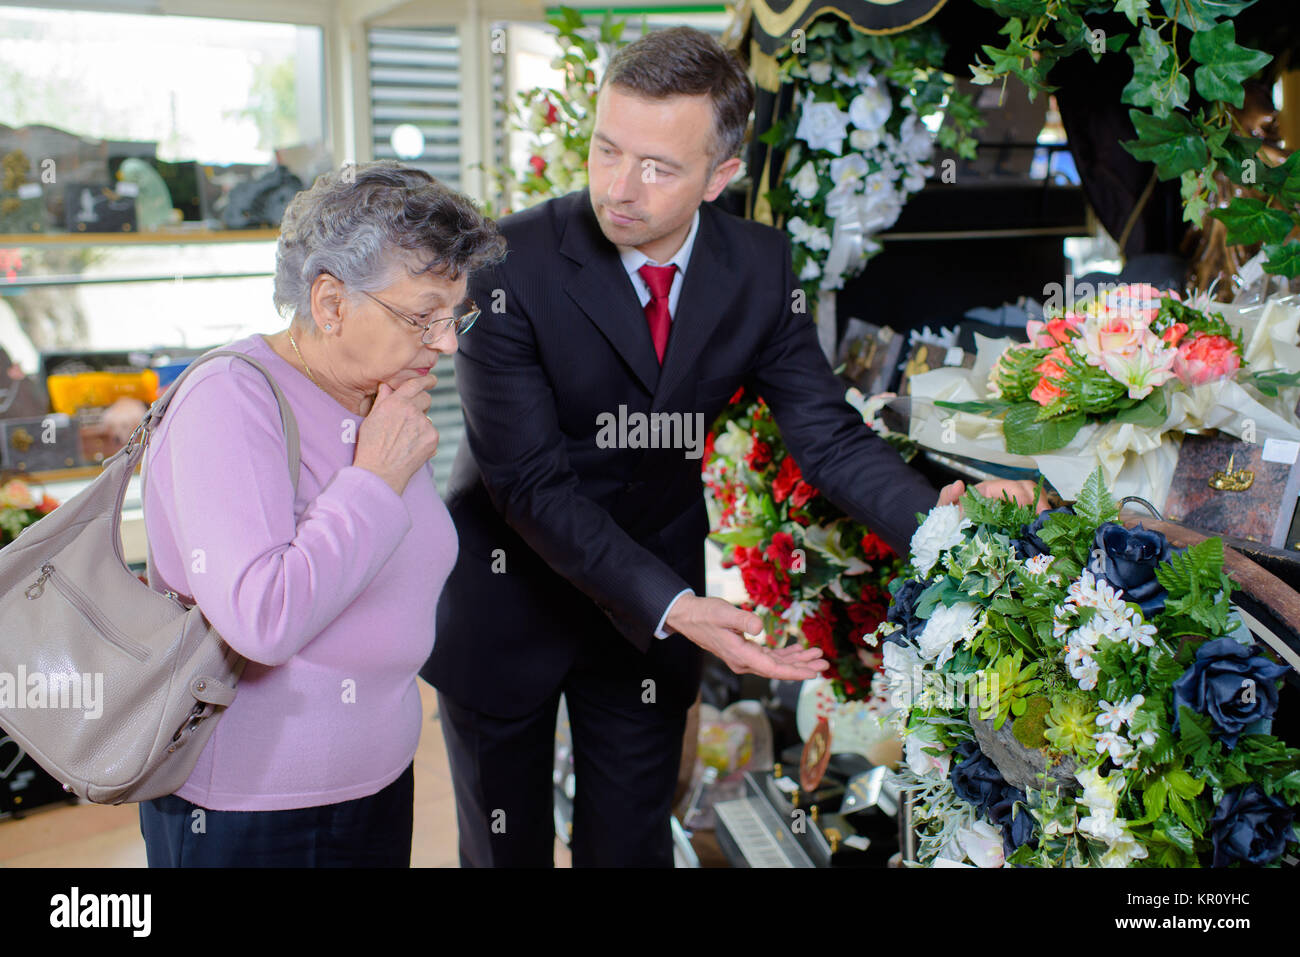 choosing a bouquet - Stock Image